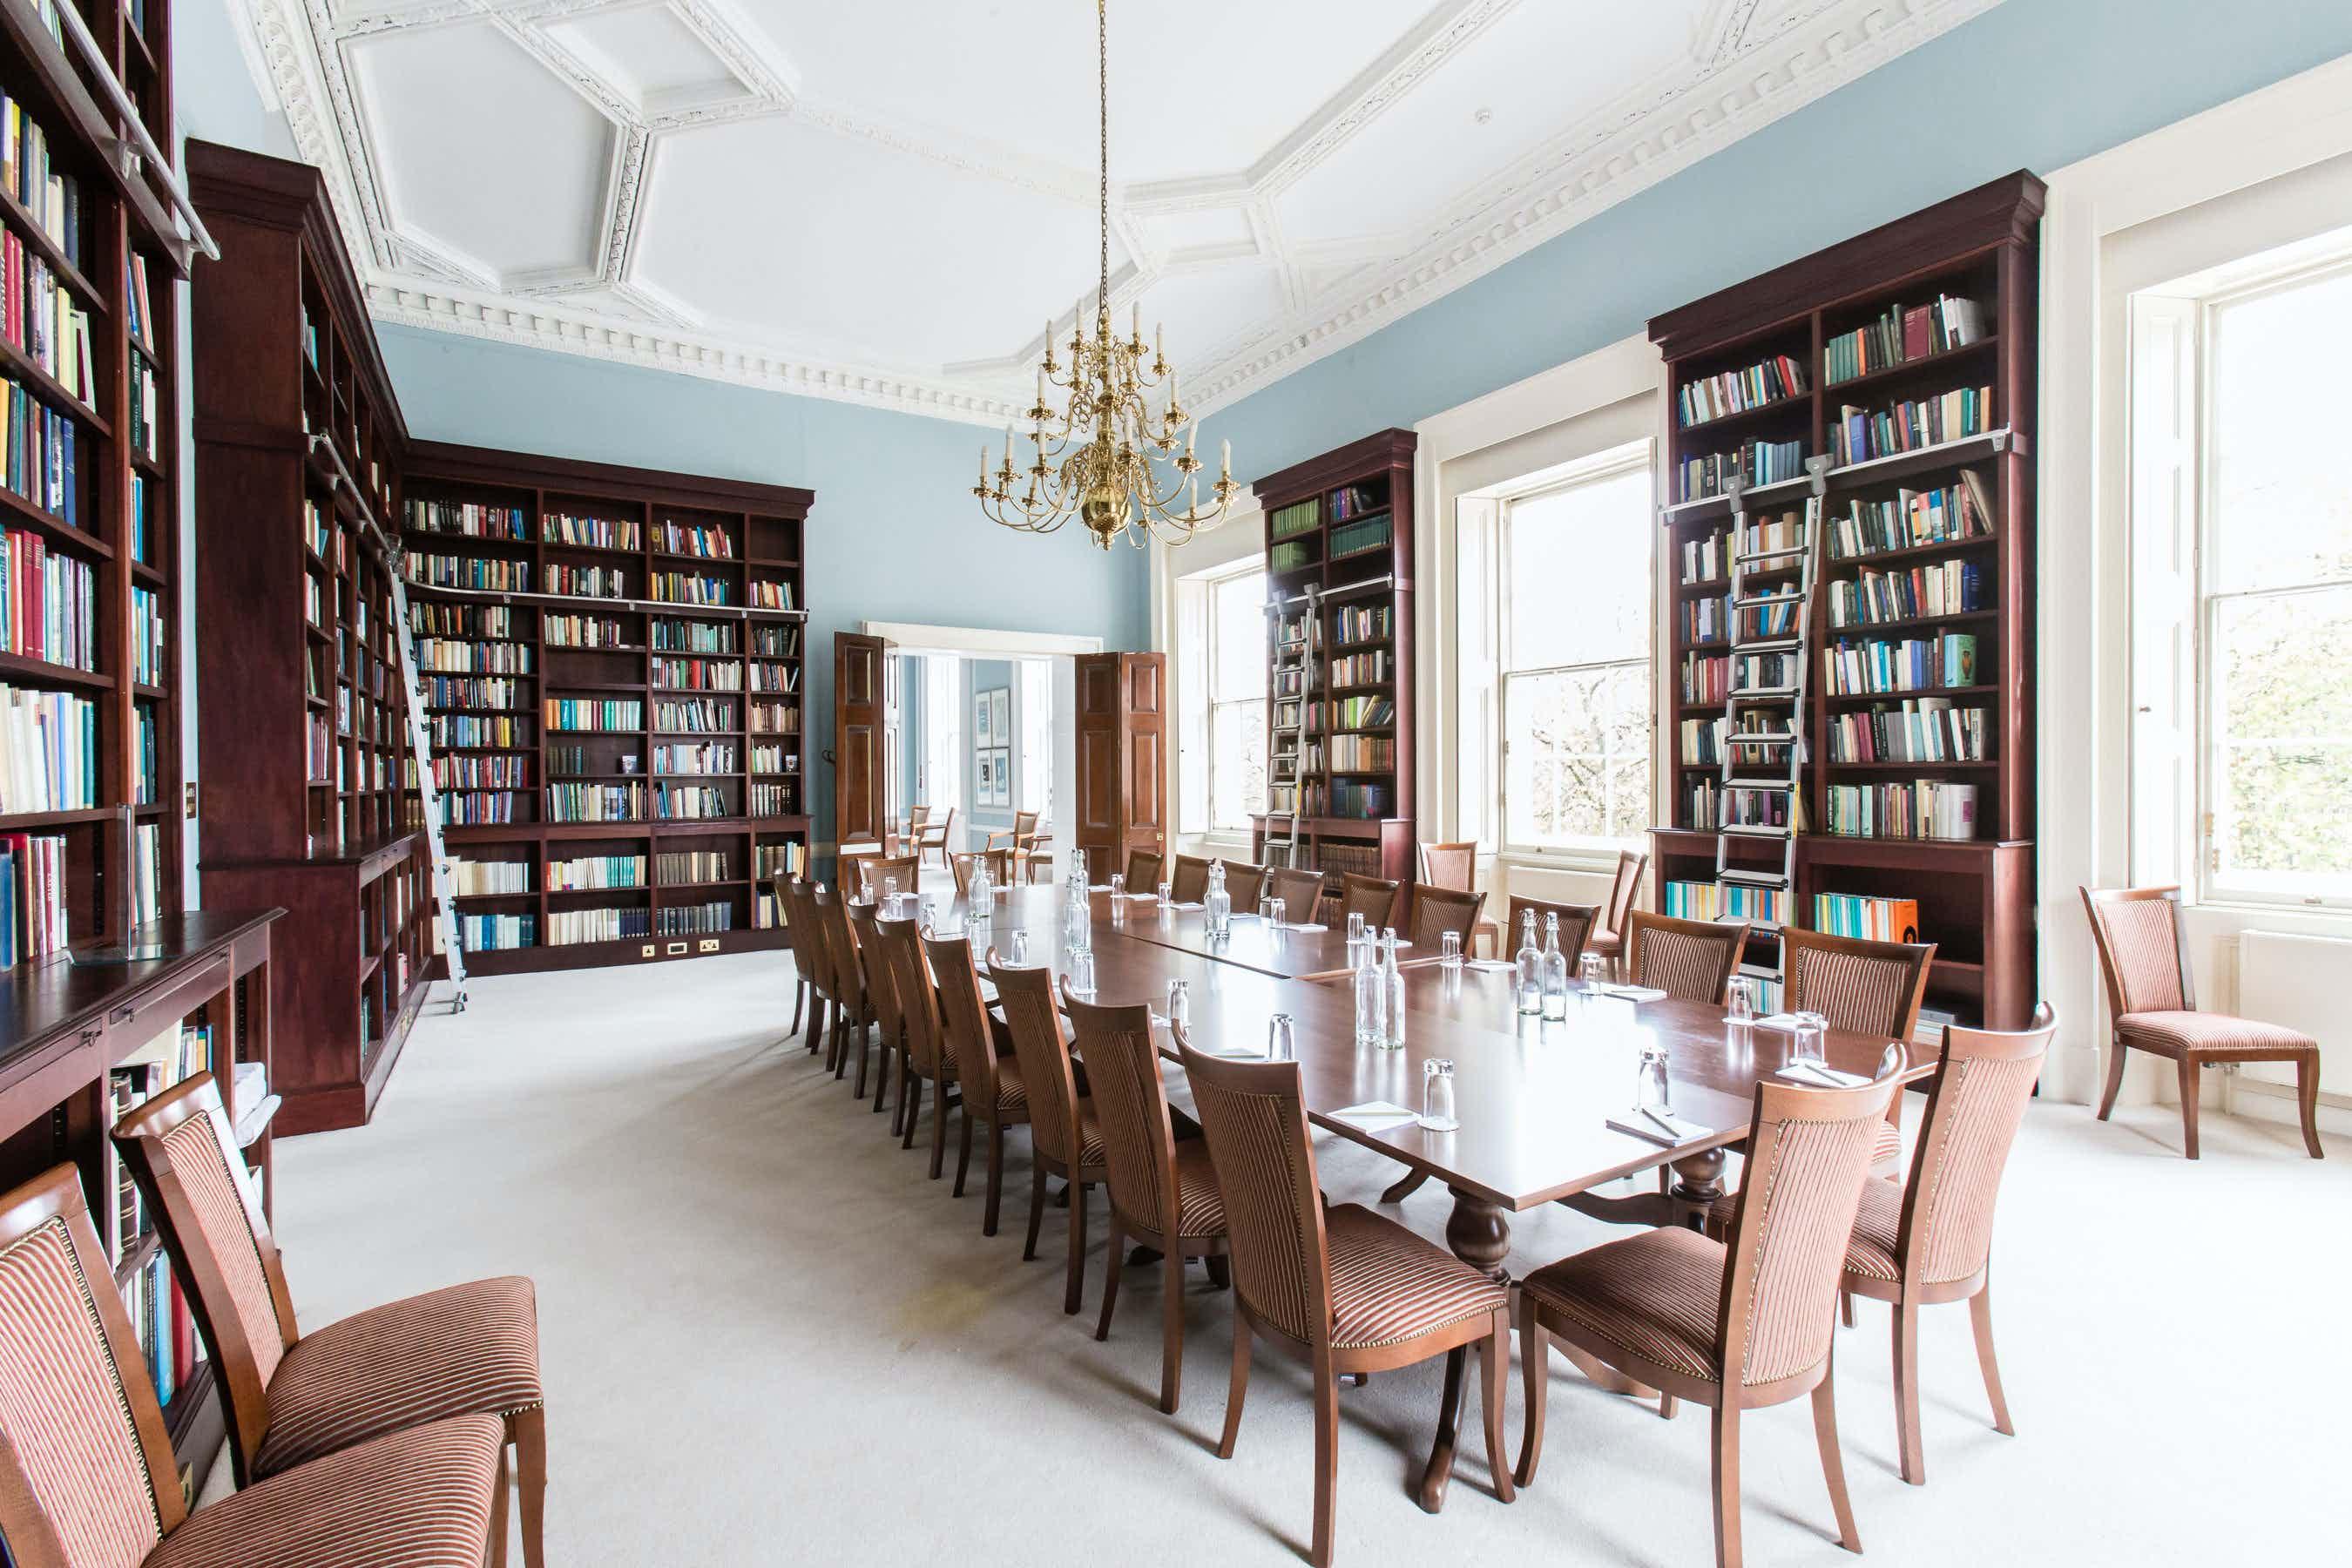 Lee Library, 10-11 Carlton House Terrace